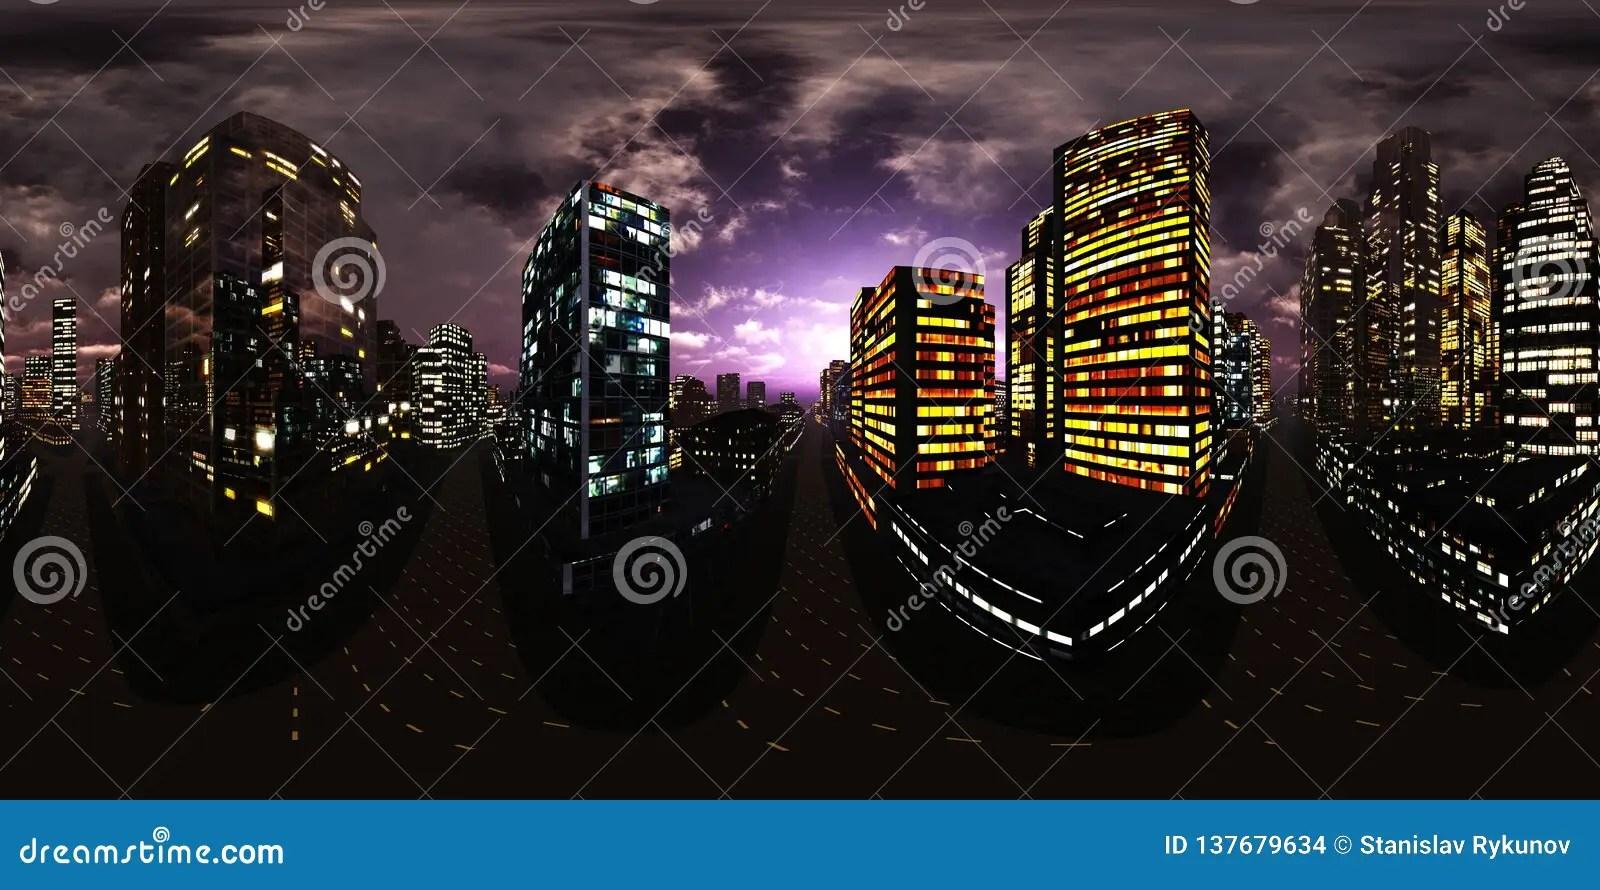 night city night skyscrapers